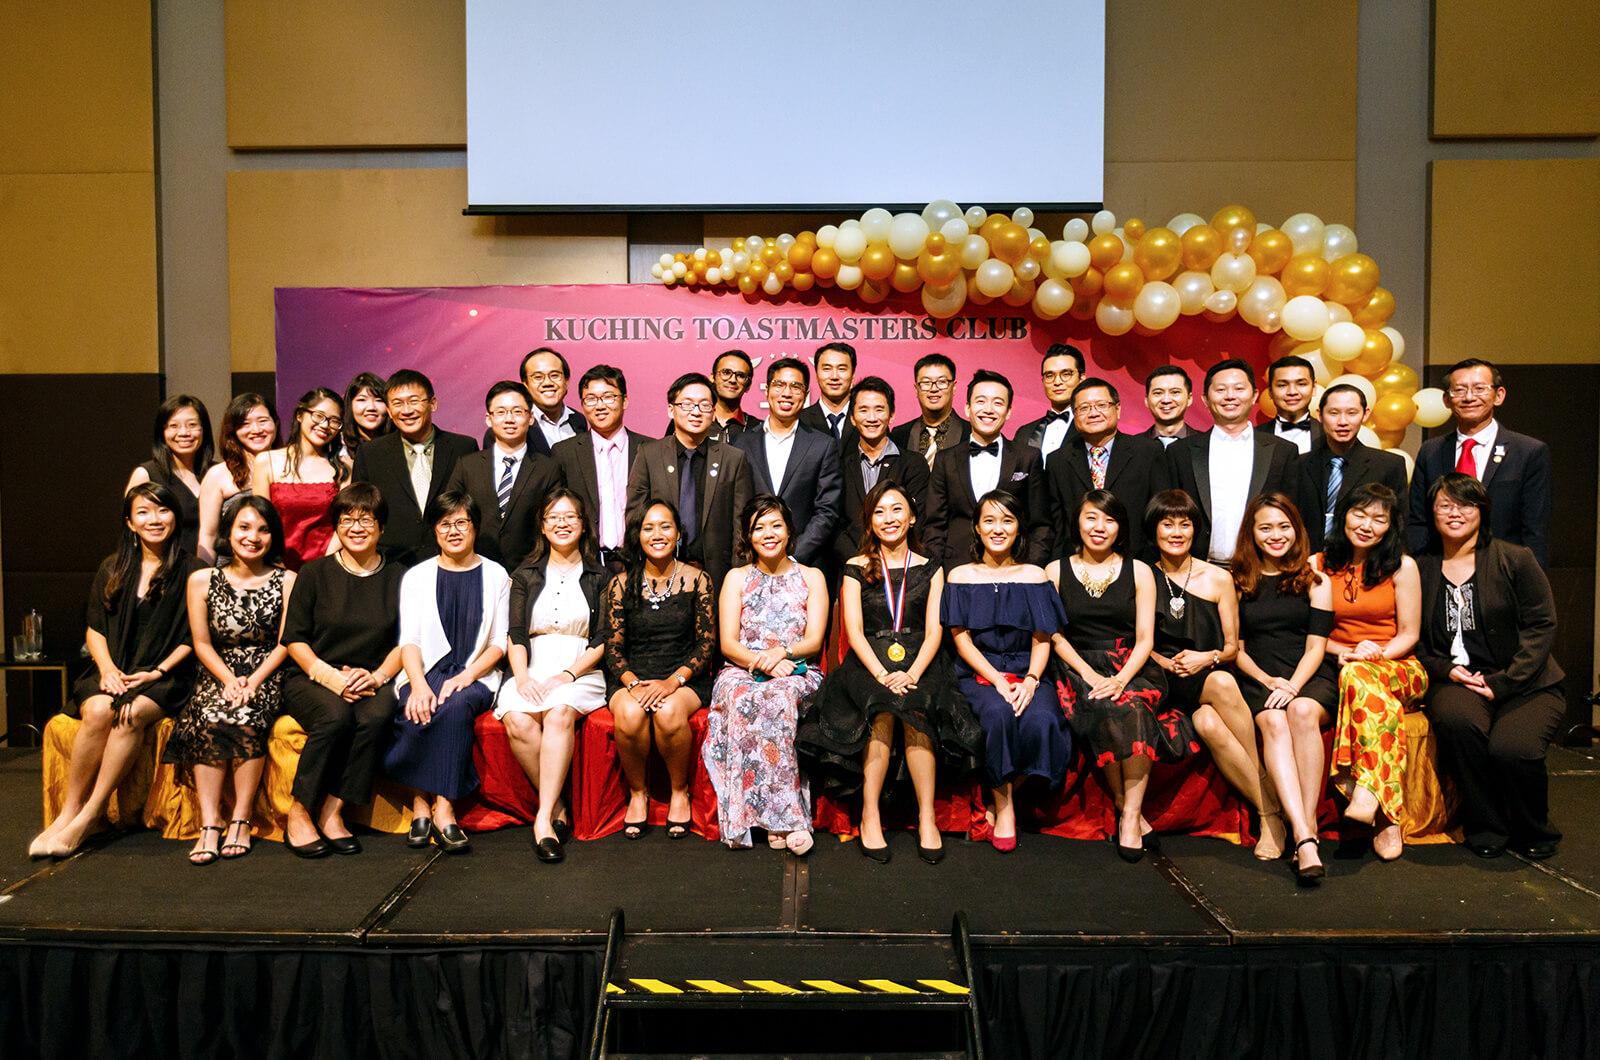 Kuching Toastmasters club in Kuching, Sarawak, Malaysia, celebrates its 30th Installation Dinner.